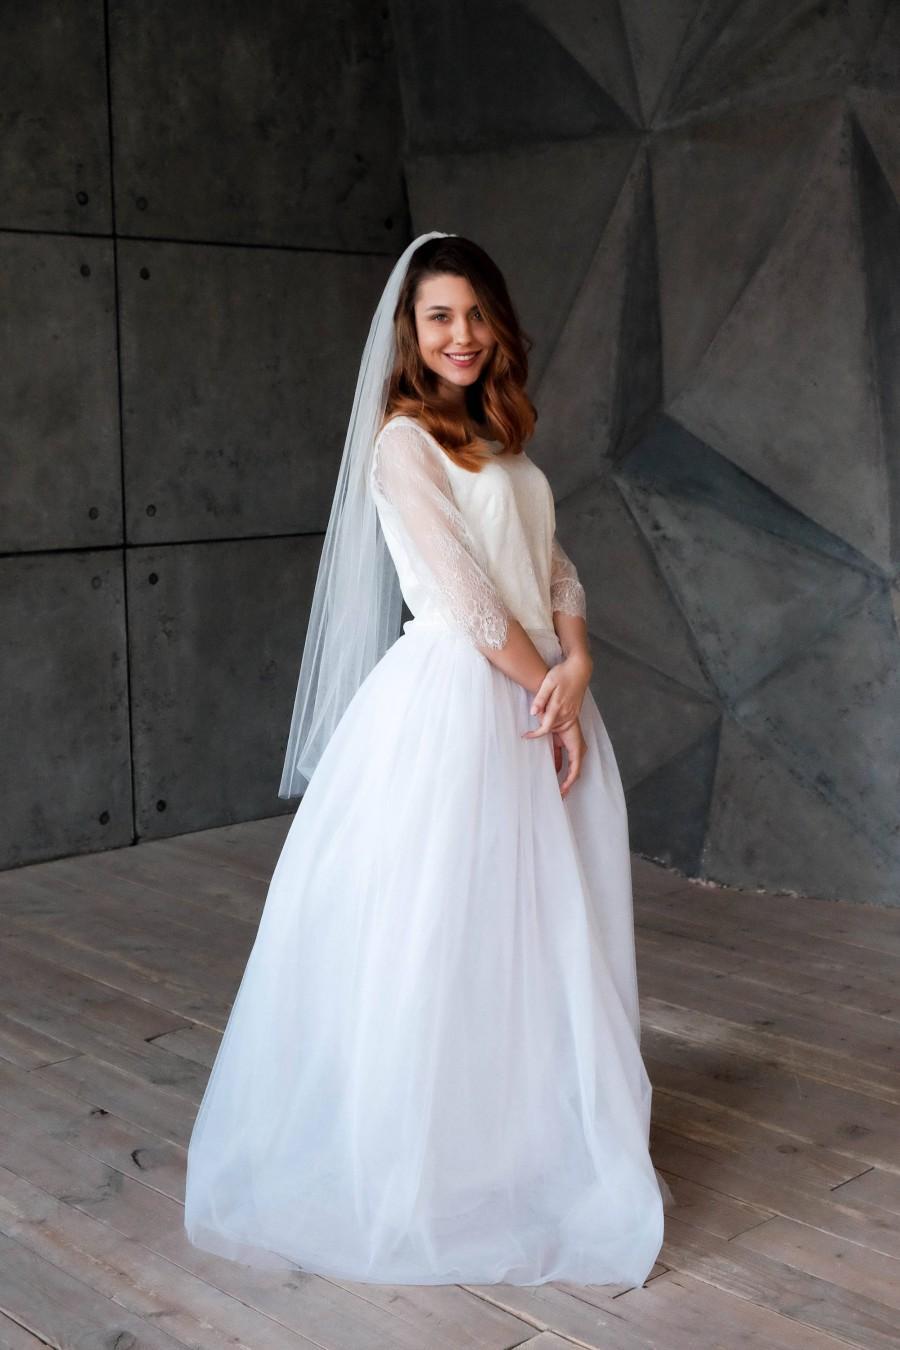 Mariage - Fingertip wedding veil, Veil, Wedding veil, Veil wedding, Cathedral veil, Bridal veil, Ivory veil